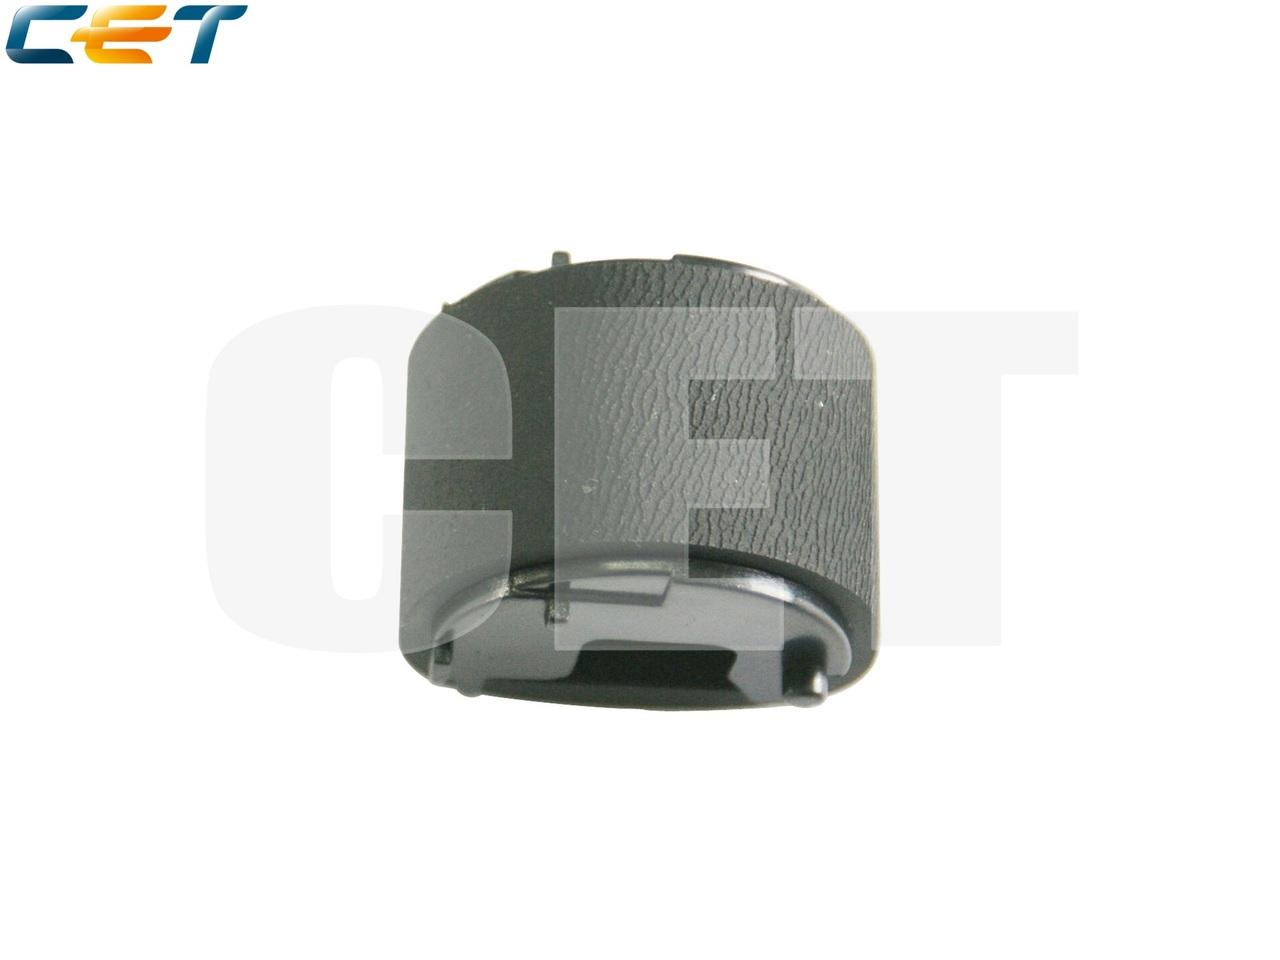 Ролик подхвата обходного лотка RL1-2120-000, RL1-3307-000для HP LaserJet P2035/P2055, M401/M425 (CET), CET3689,CET3689R